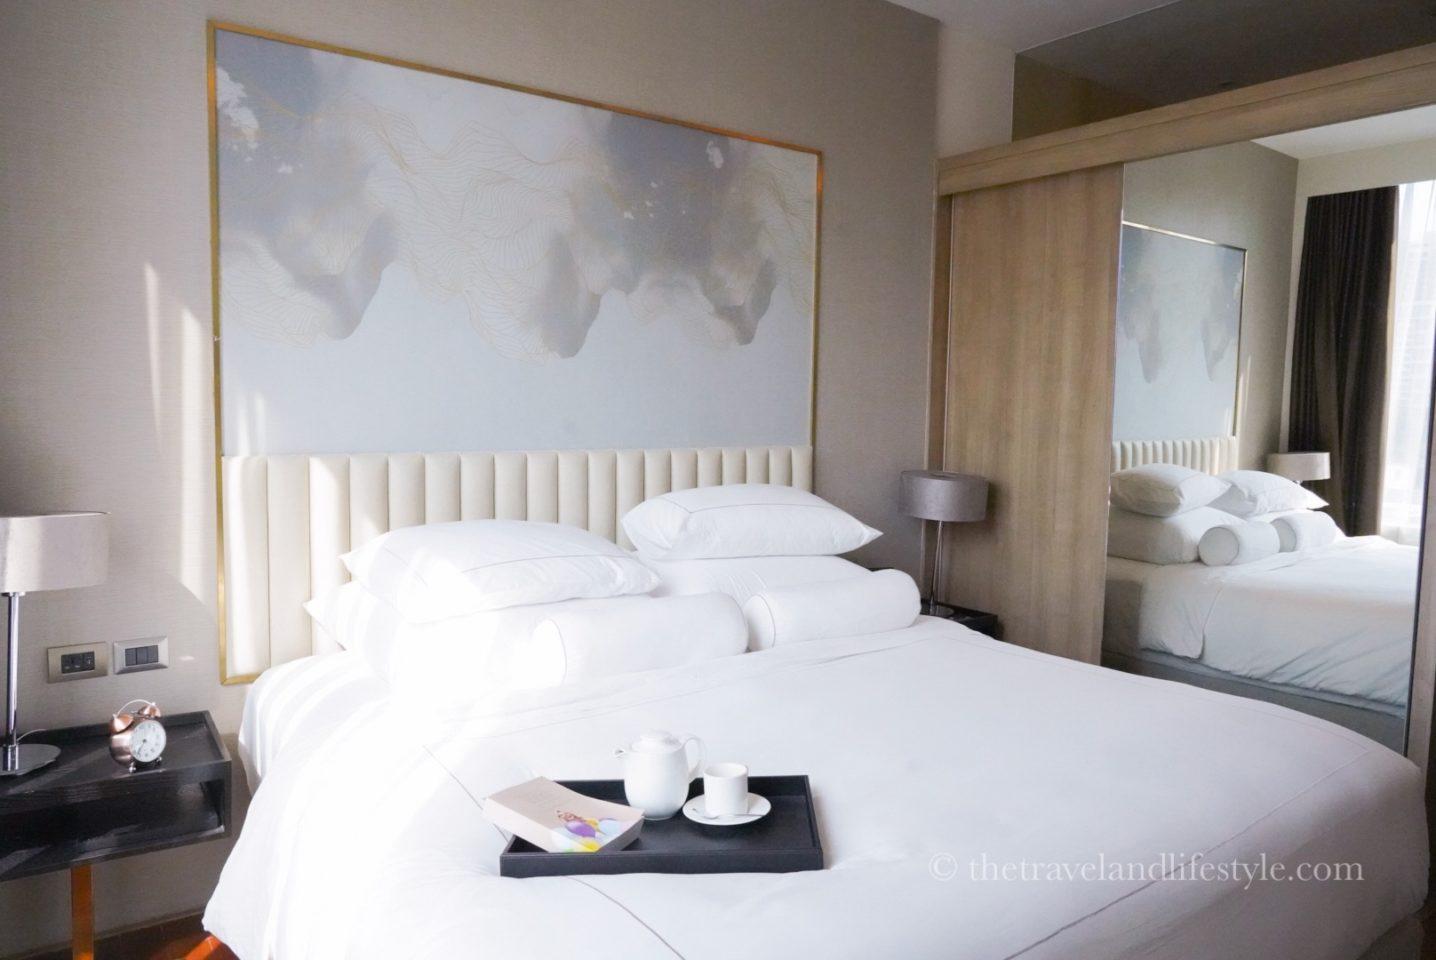 dsc08578 - akyra Thonglor Bangkok -  バンコクのラグジュアリーデザイナーズホテル